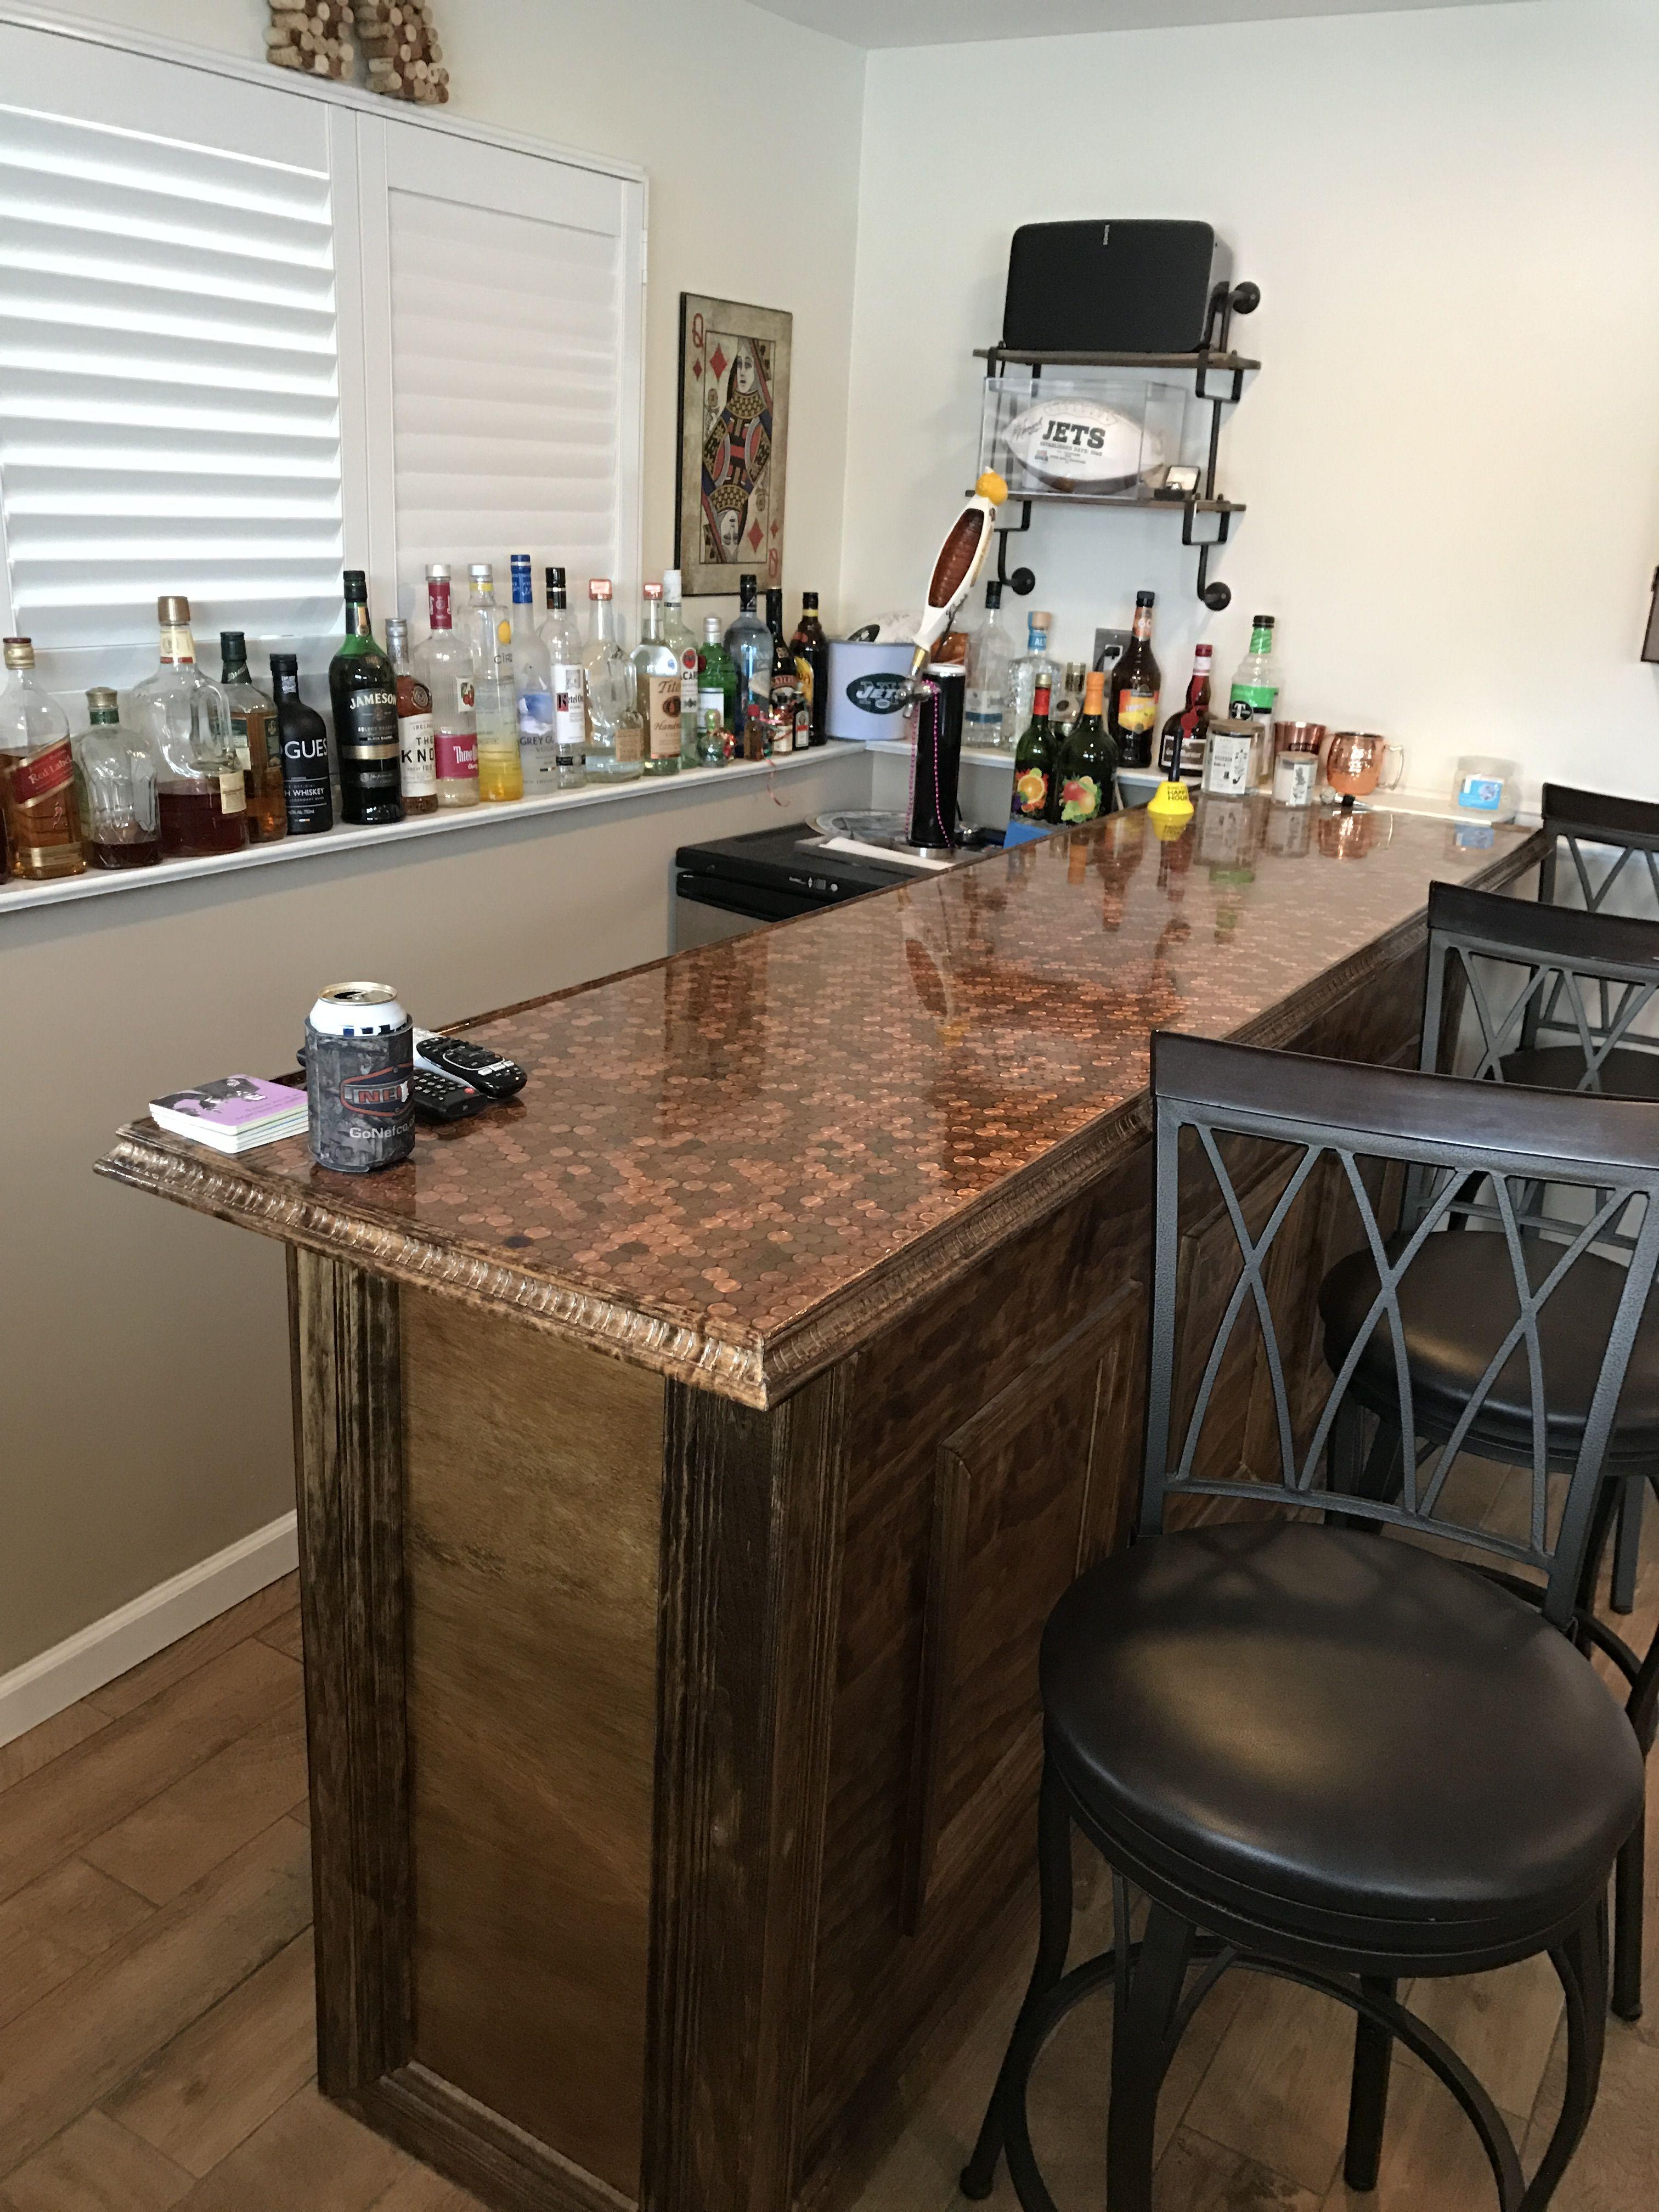 My Penny Top Bar Stuff Corner Desk Desk Kitchen Island